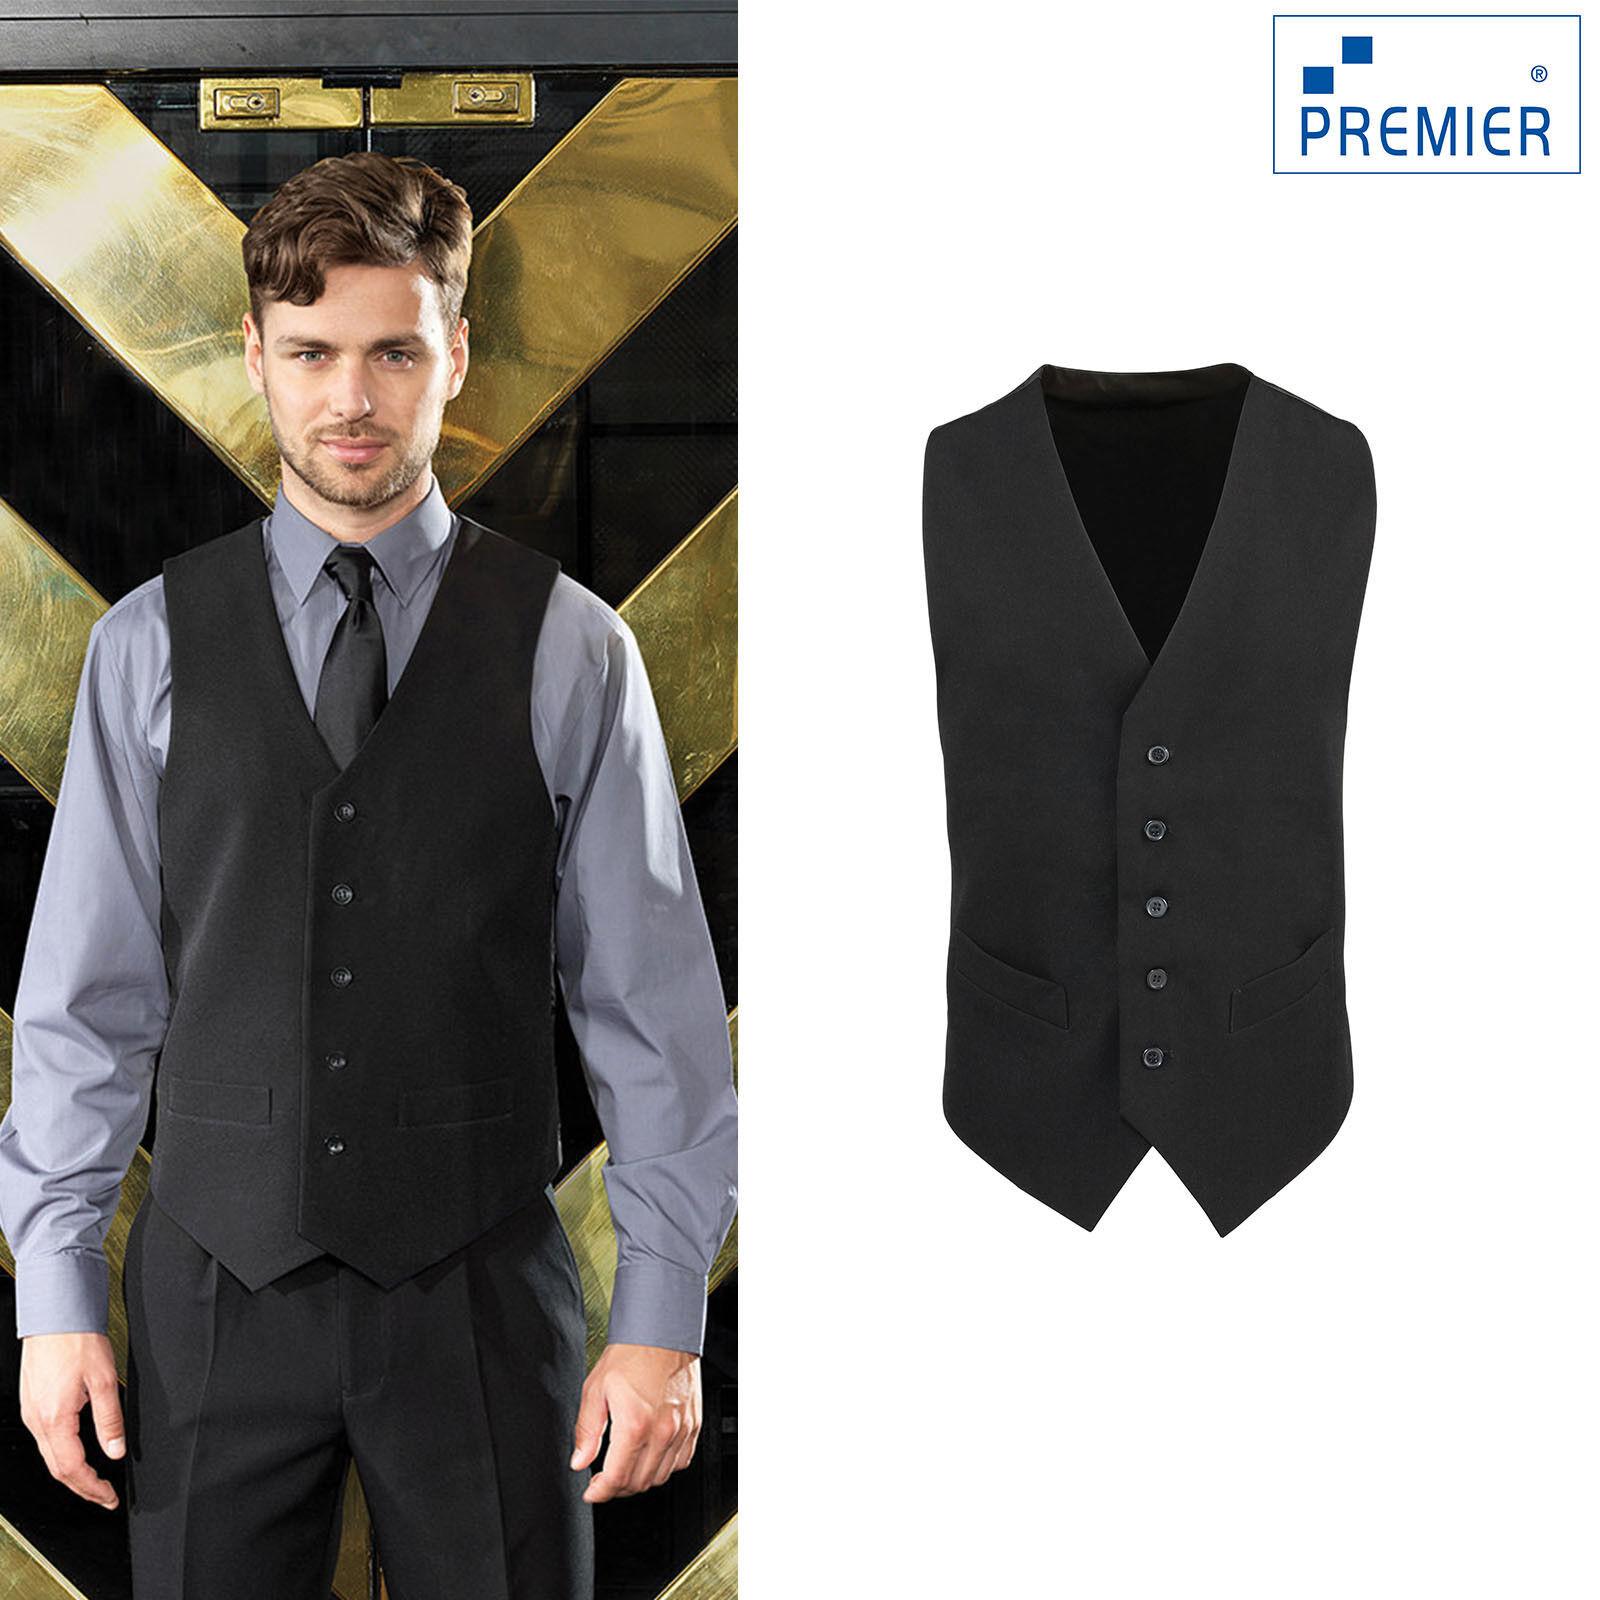 Premier Lined Polyester Waistcoat PR622